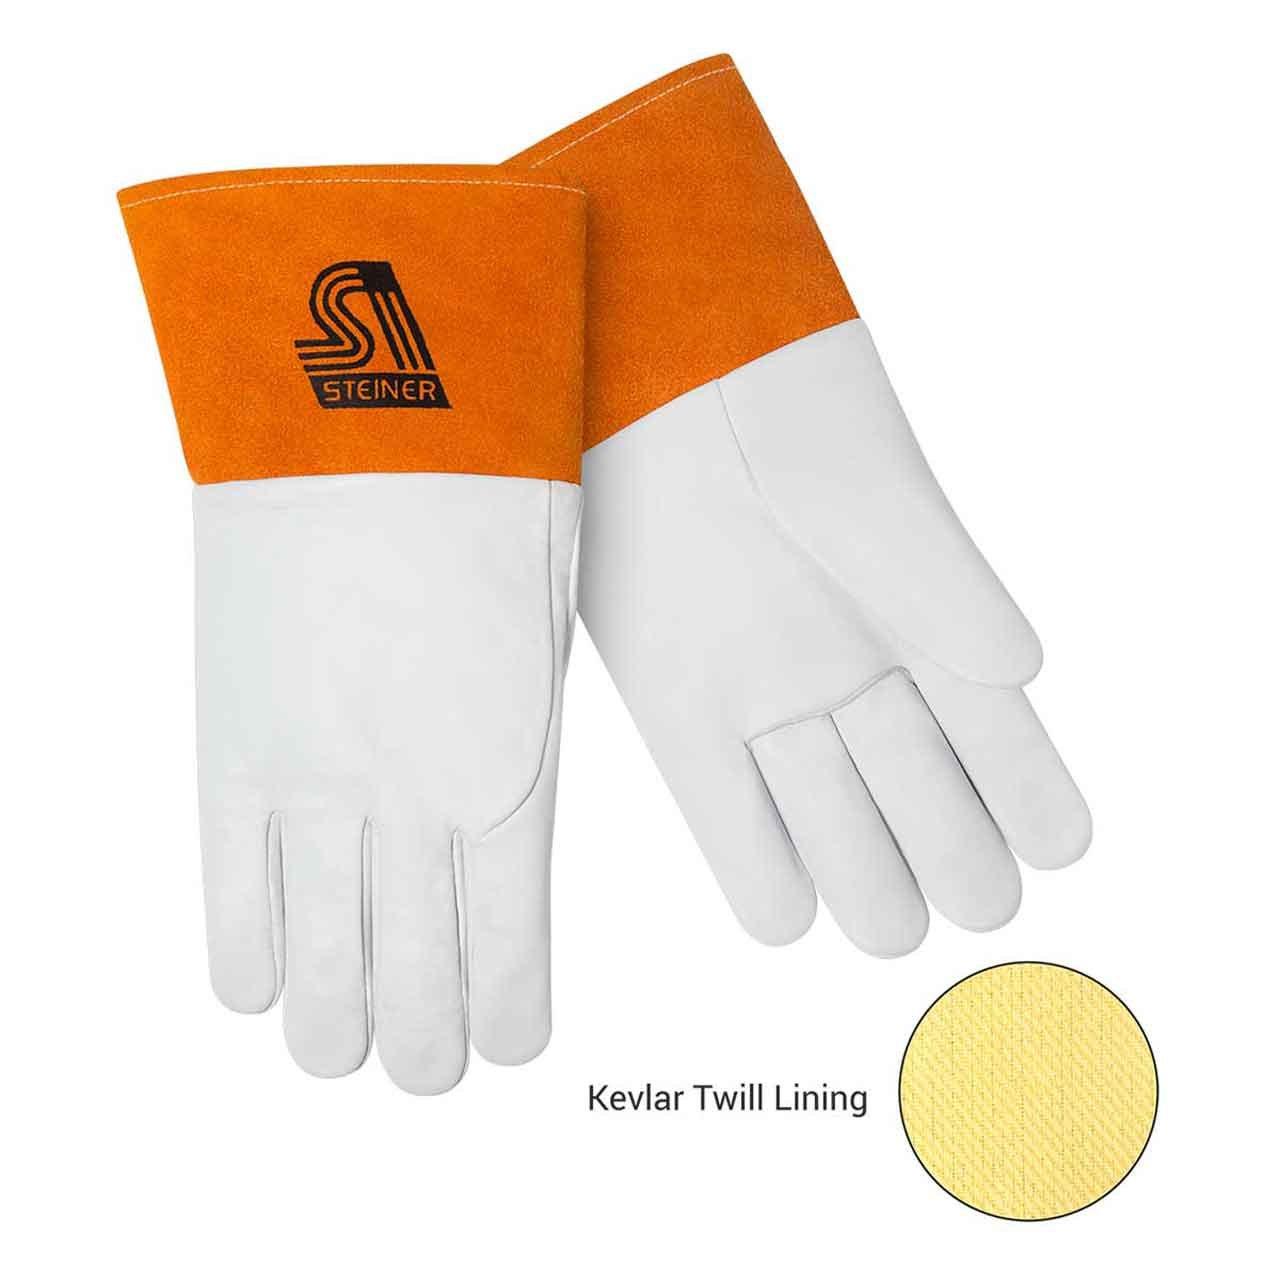 Steiner 0224K-X Kevlar Lined SensiTIG Premium Grain Kidskin TIG Welding Gloves with Long Cuff, Tan, X-Large